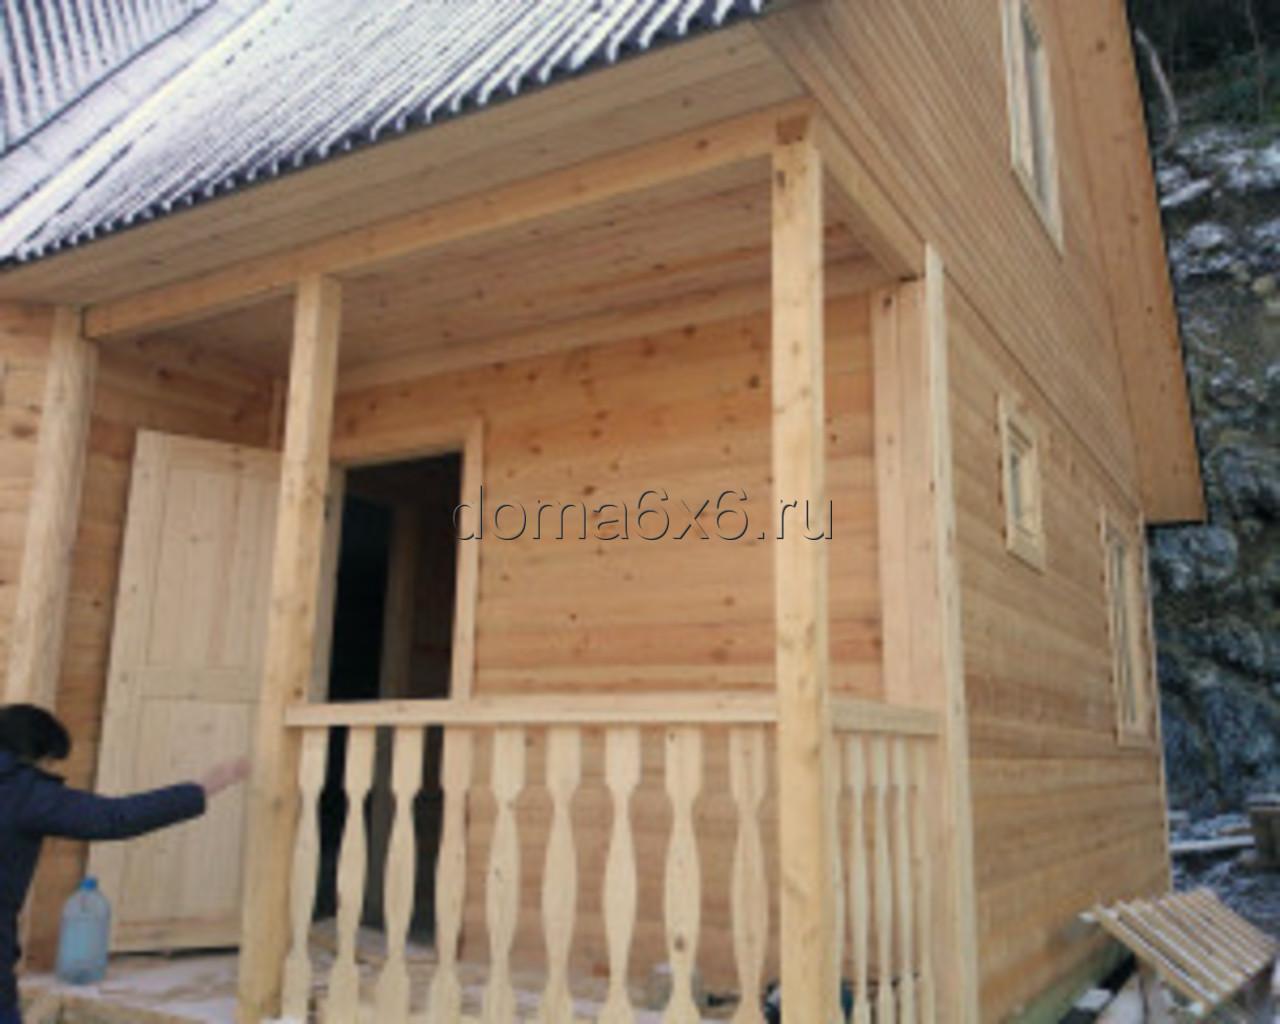 Строительство дома из бруса в Туапсе - 6